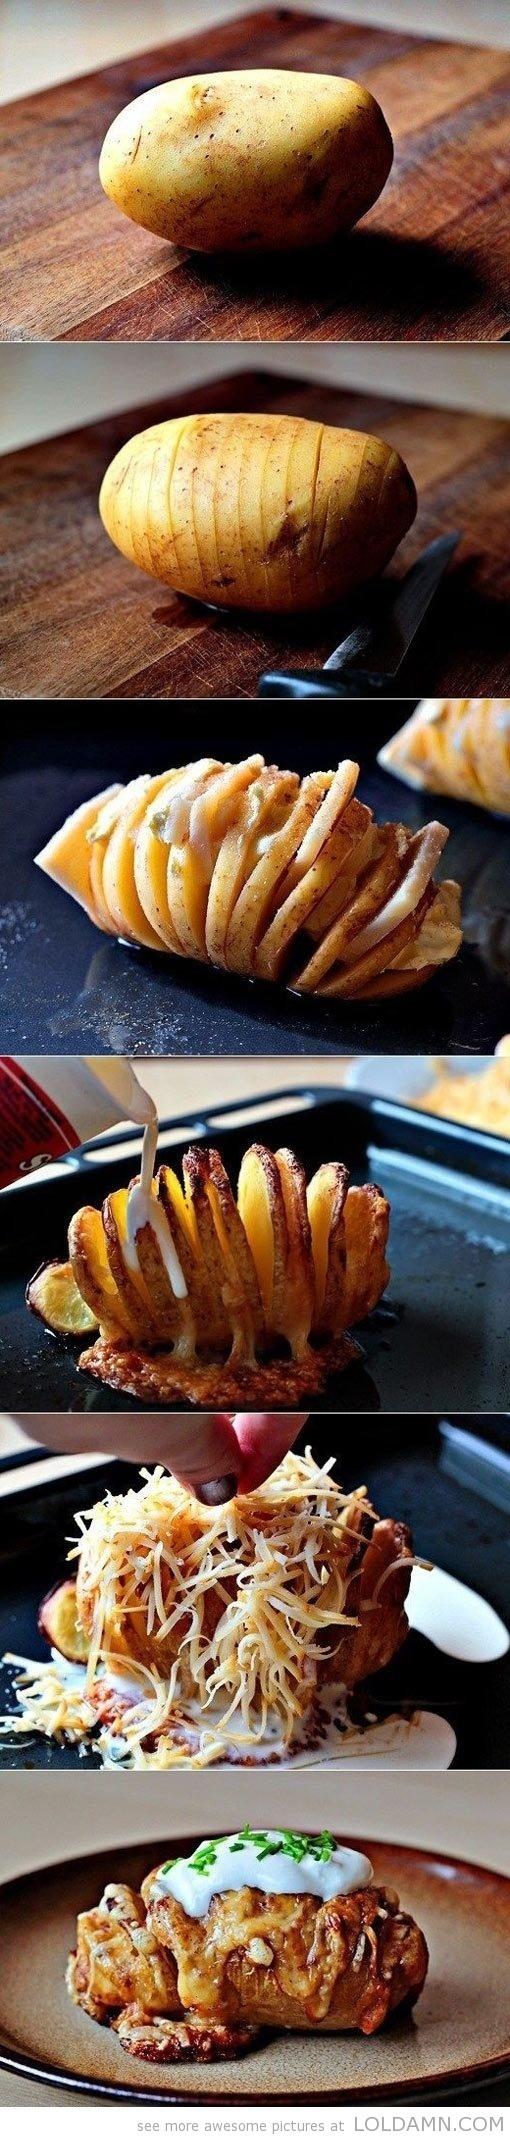 stuffed potatoes so delicious OMG :O Hail the HOLY POTATO !!